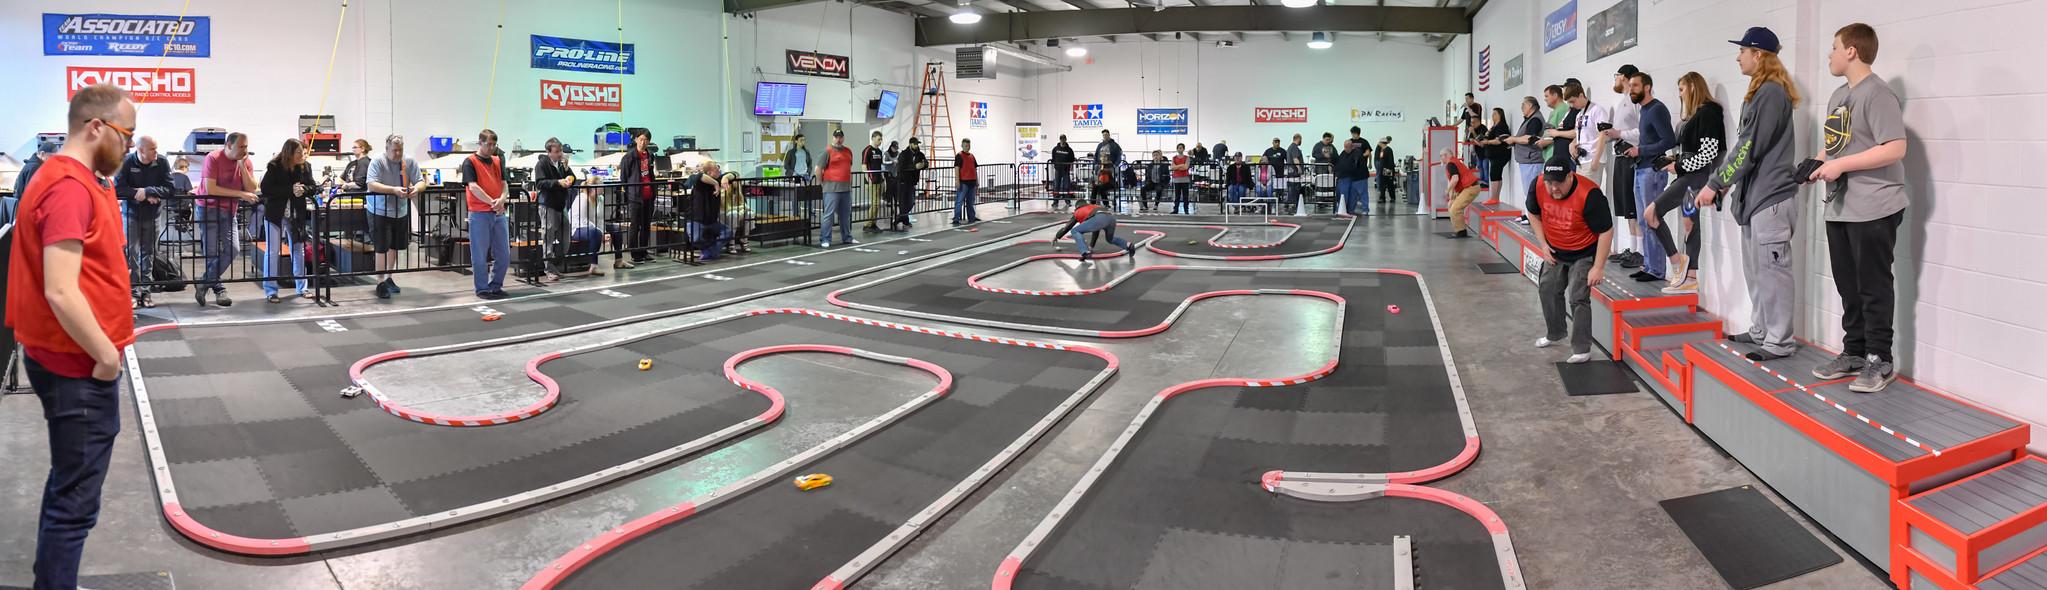 Raceway-Pano